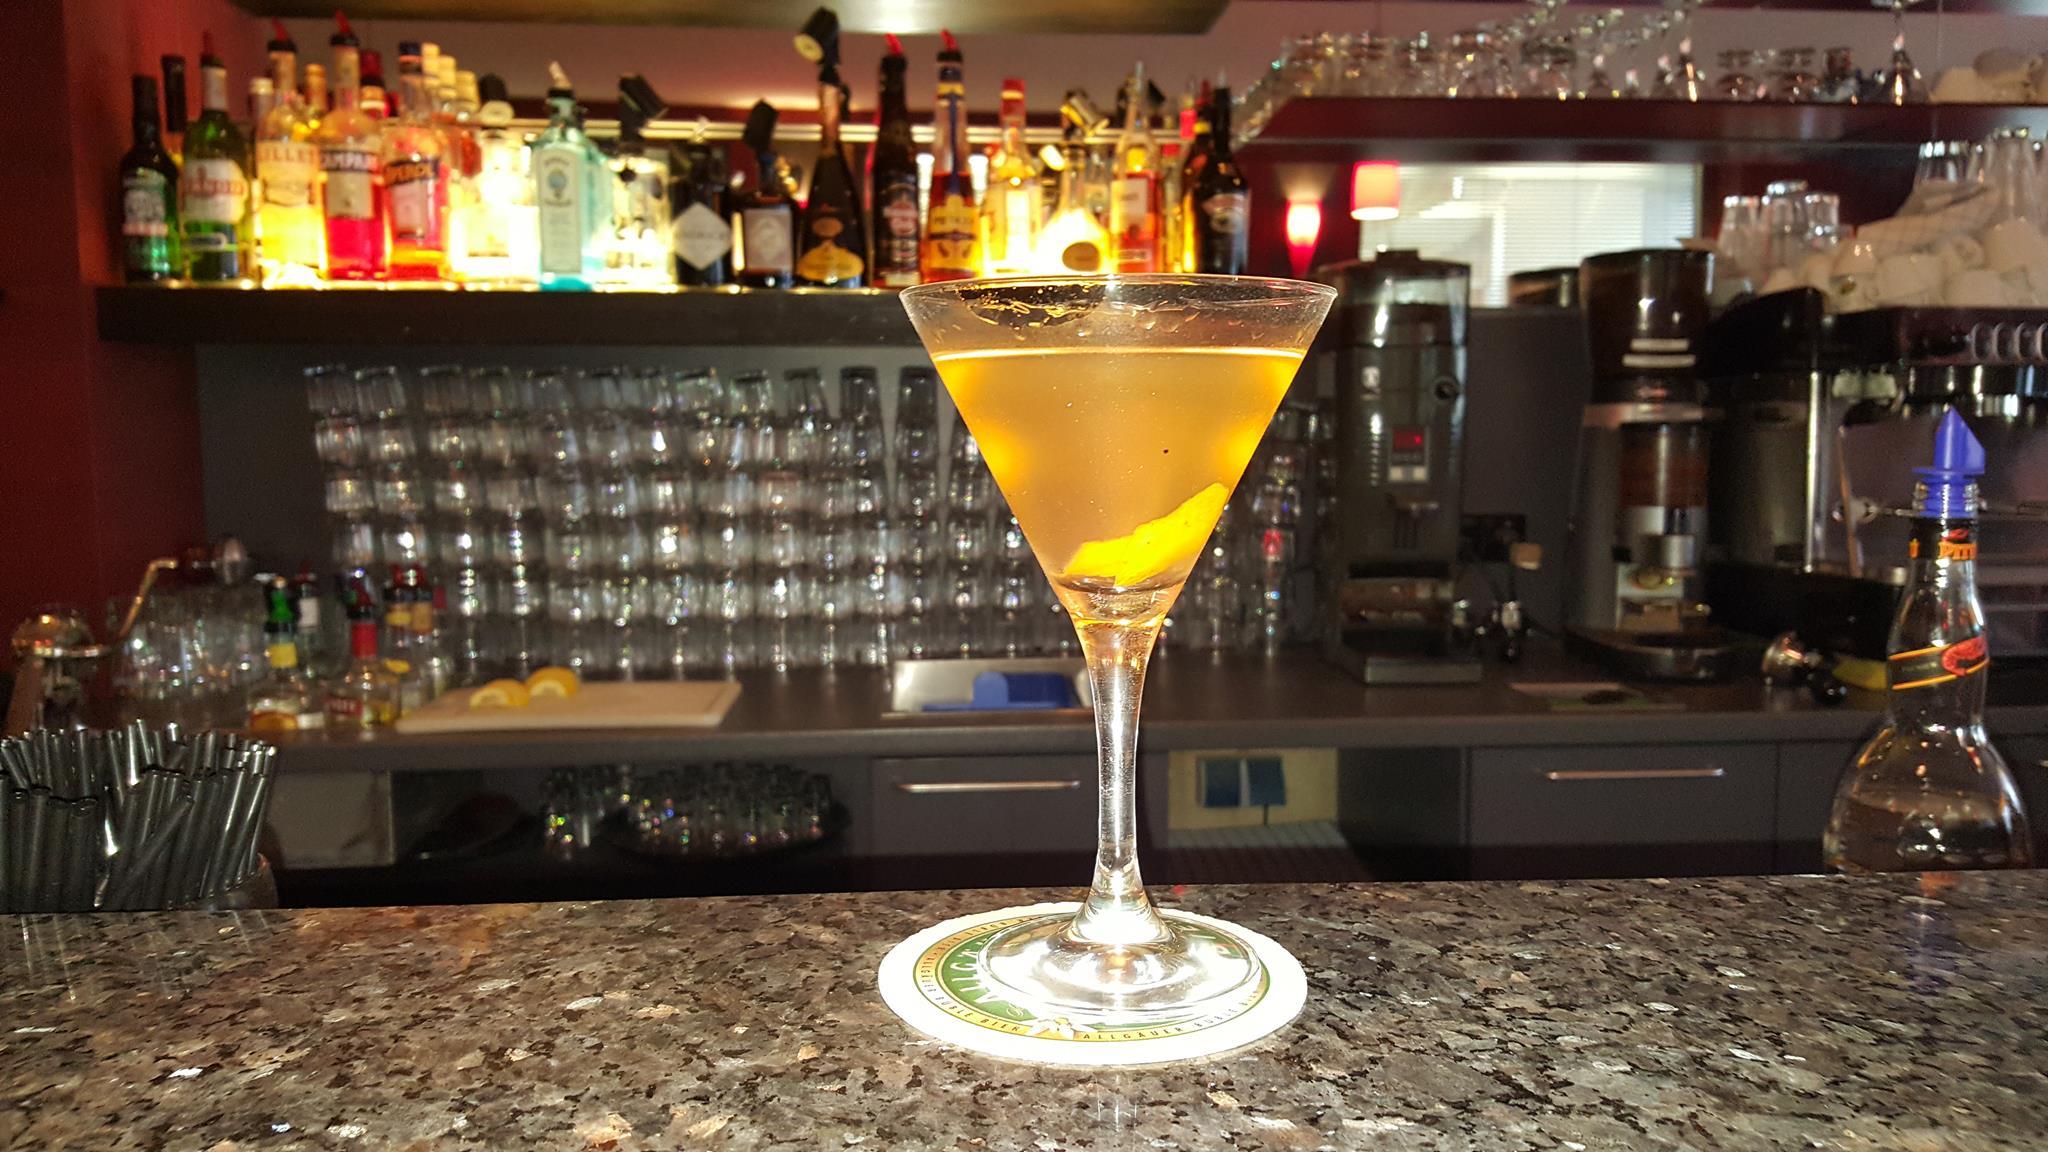 "Improvisierter Provinz-Martini in Kempten im Allgäu. Motto der Trio Bar: ""Homedrinking is killing my business."" Na dann, Prost!"